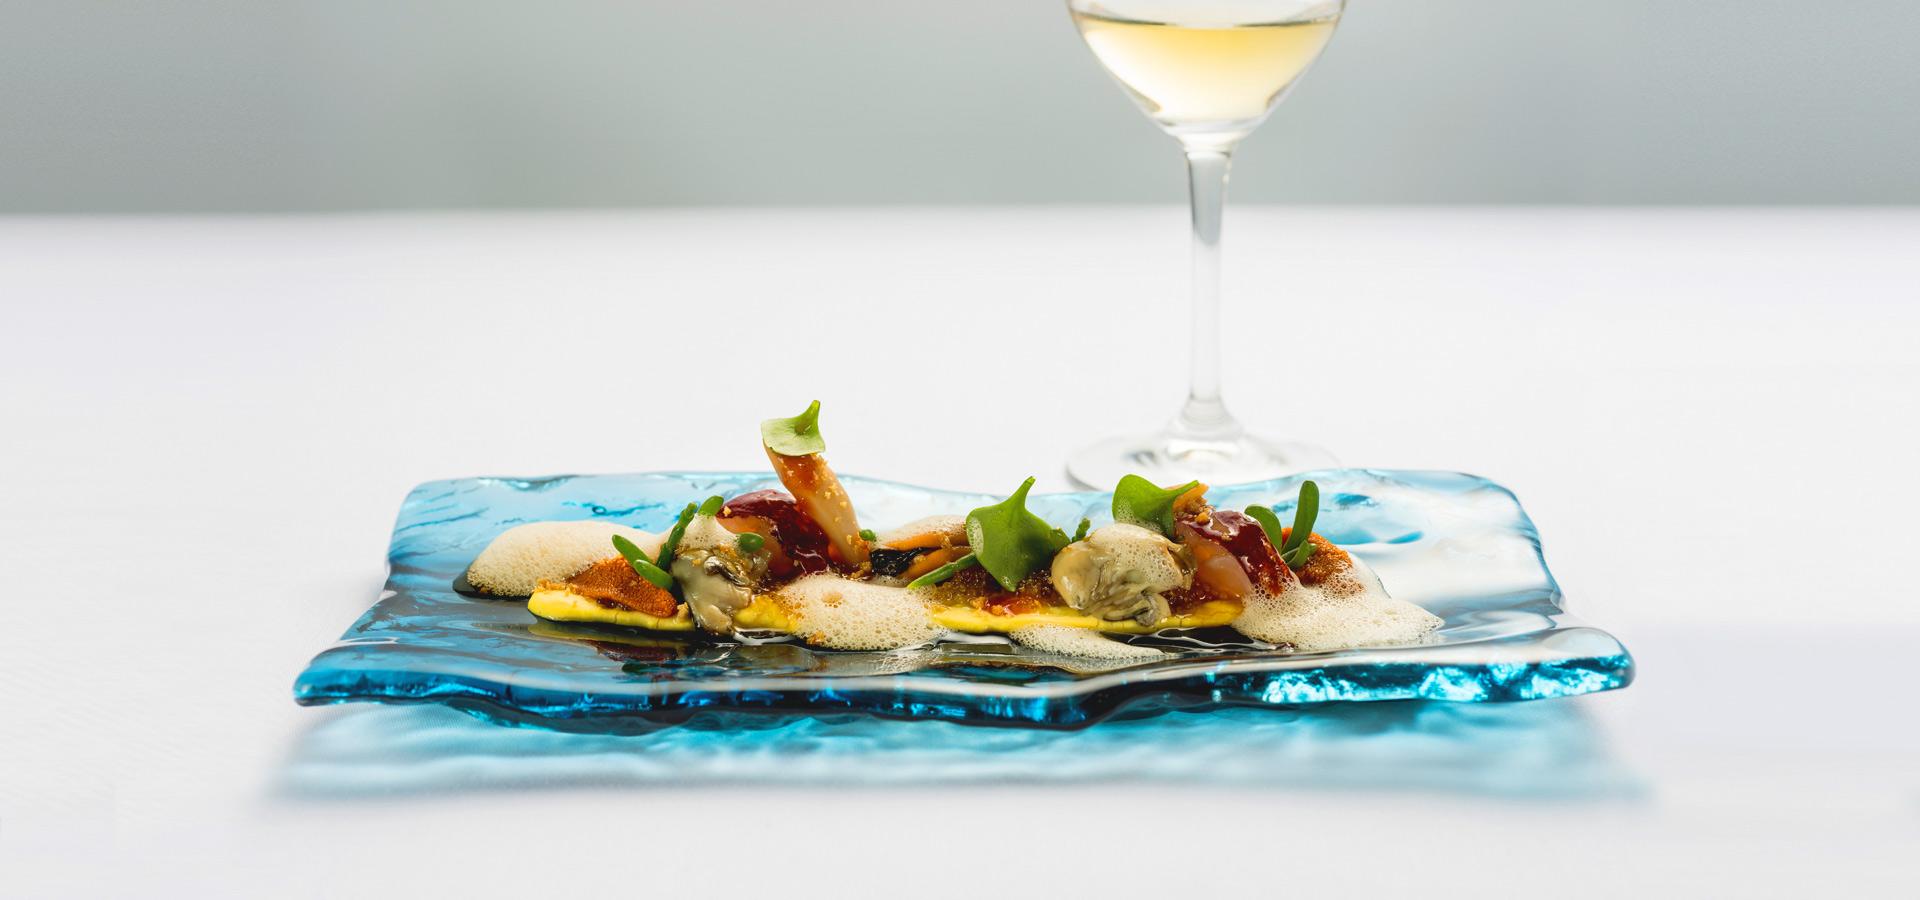 Portuguese Gastronomy: Best Luxury Restaurants in PortugalPortuguese Gastronomy: Best Luxury Restaurants in Portugal luxury restaurants Portuguese Gastronomy: Best Luxury Restaurants in Portugal michelin star restaurant porto 2  57777828358cac7ee9e7e1